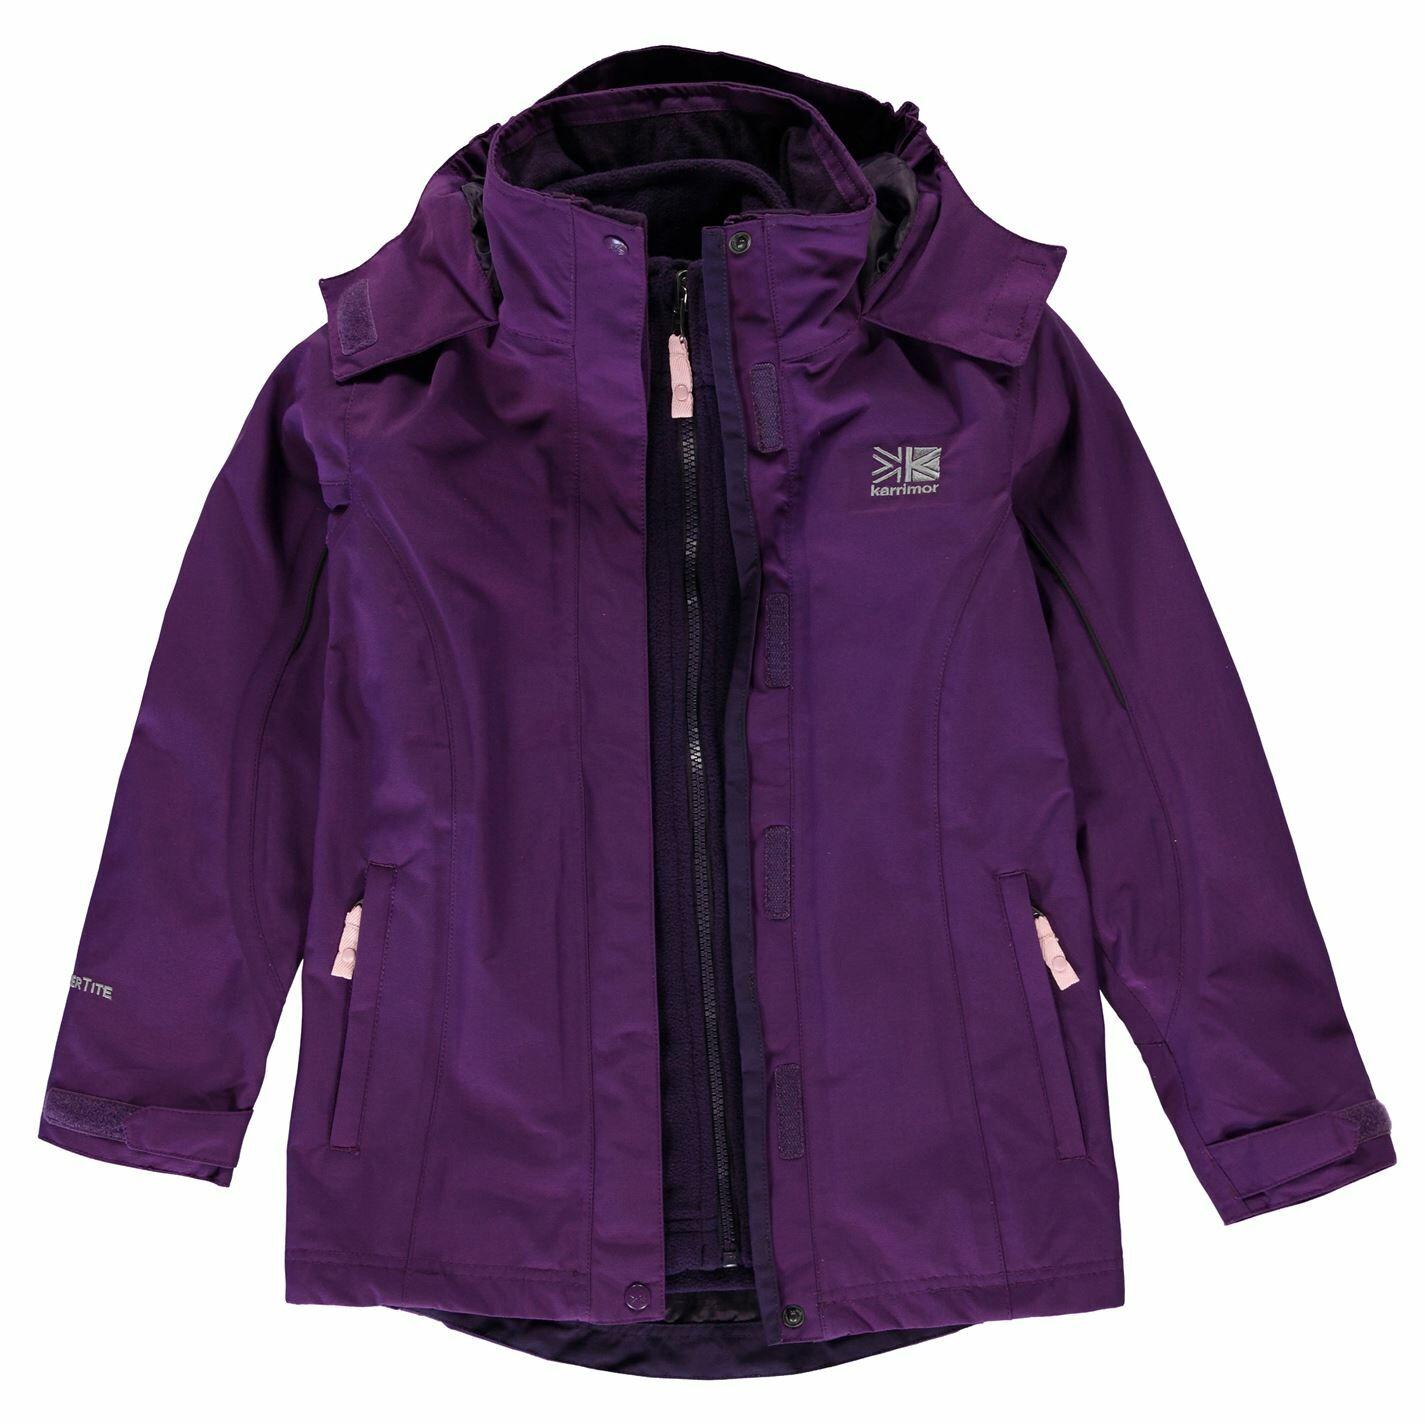 65a3ca0cd87f Karrimor Charcoal 3in1 Jacket Junior (44842877 7) - Woomie.gr